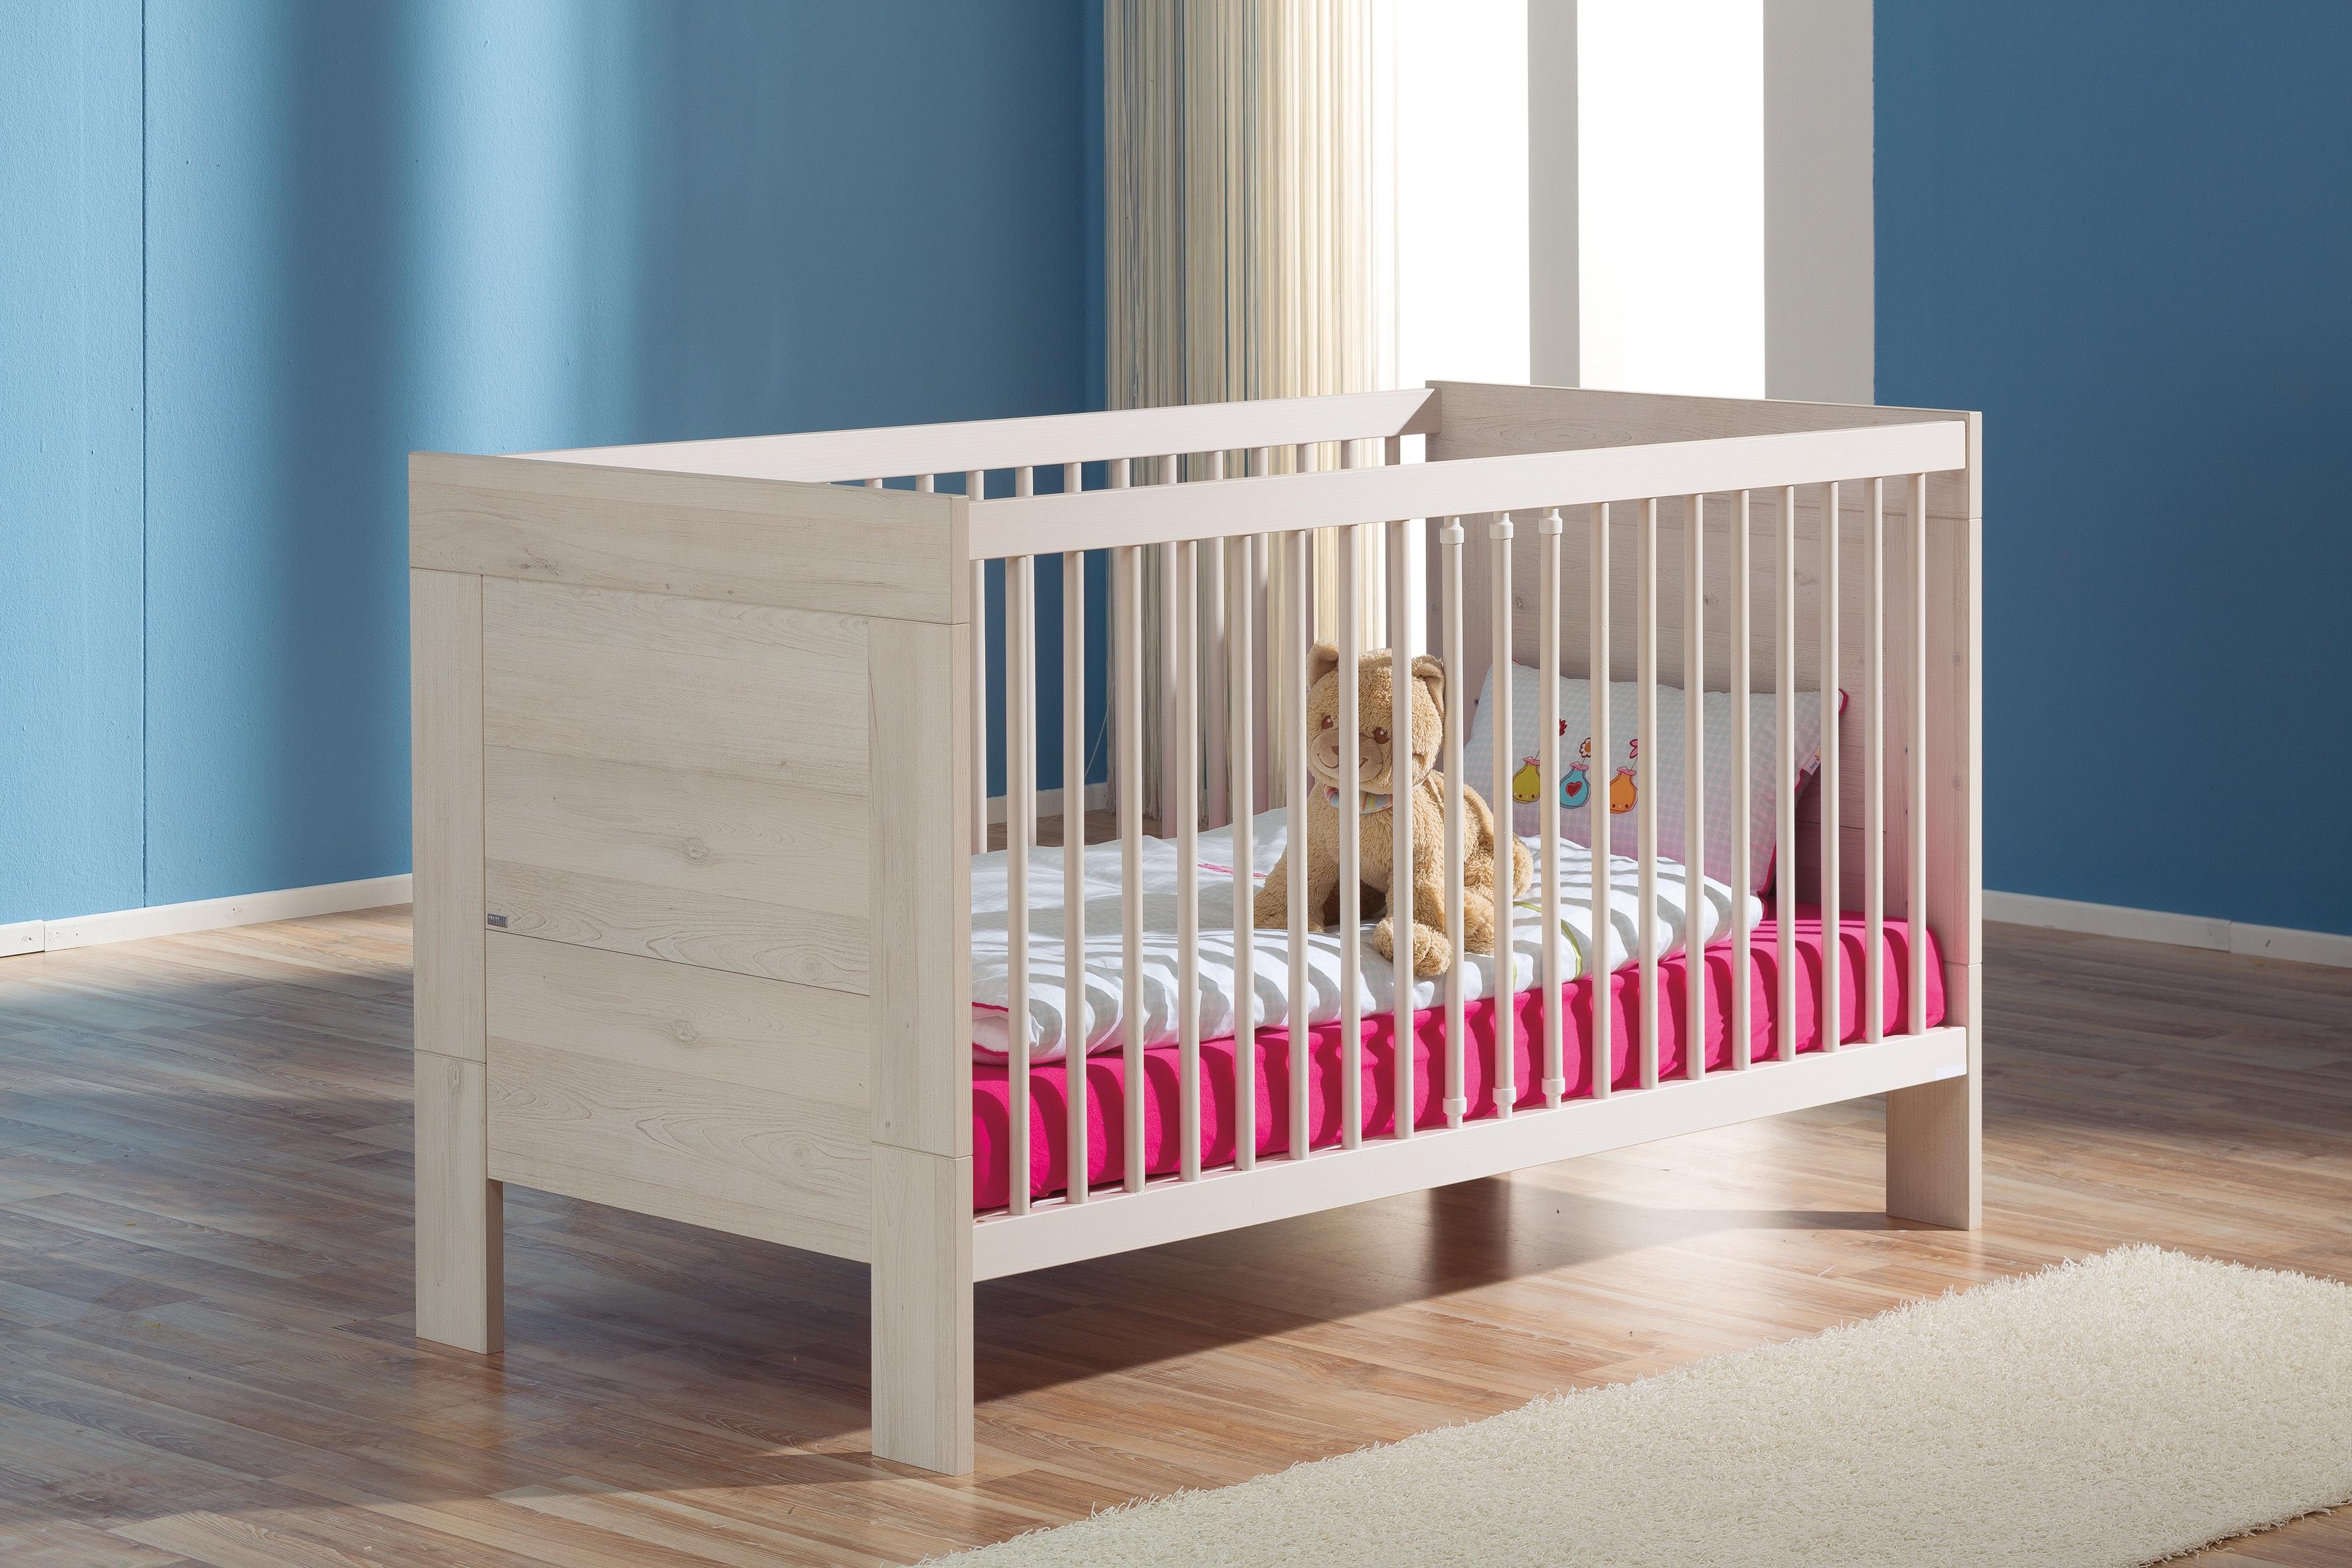 paidi babyzimmer mees scandic wood m bel letz ihr online shop. Black Bedroom Furniture Sets. Home Design Ideas